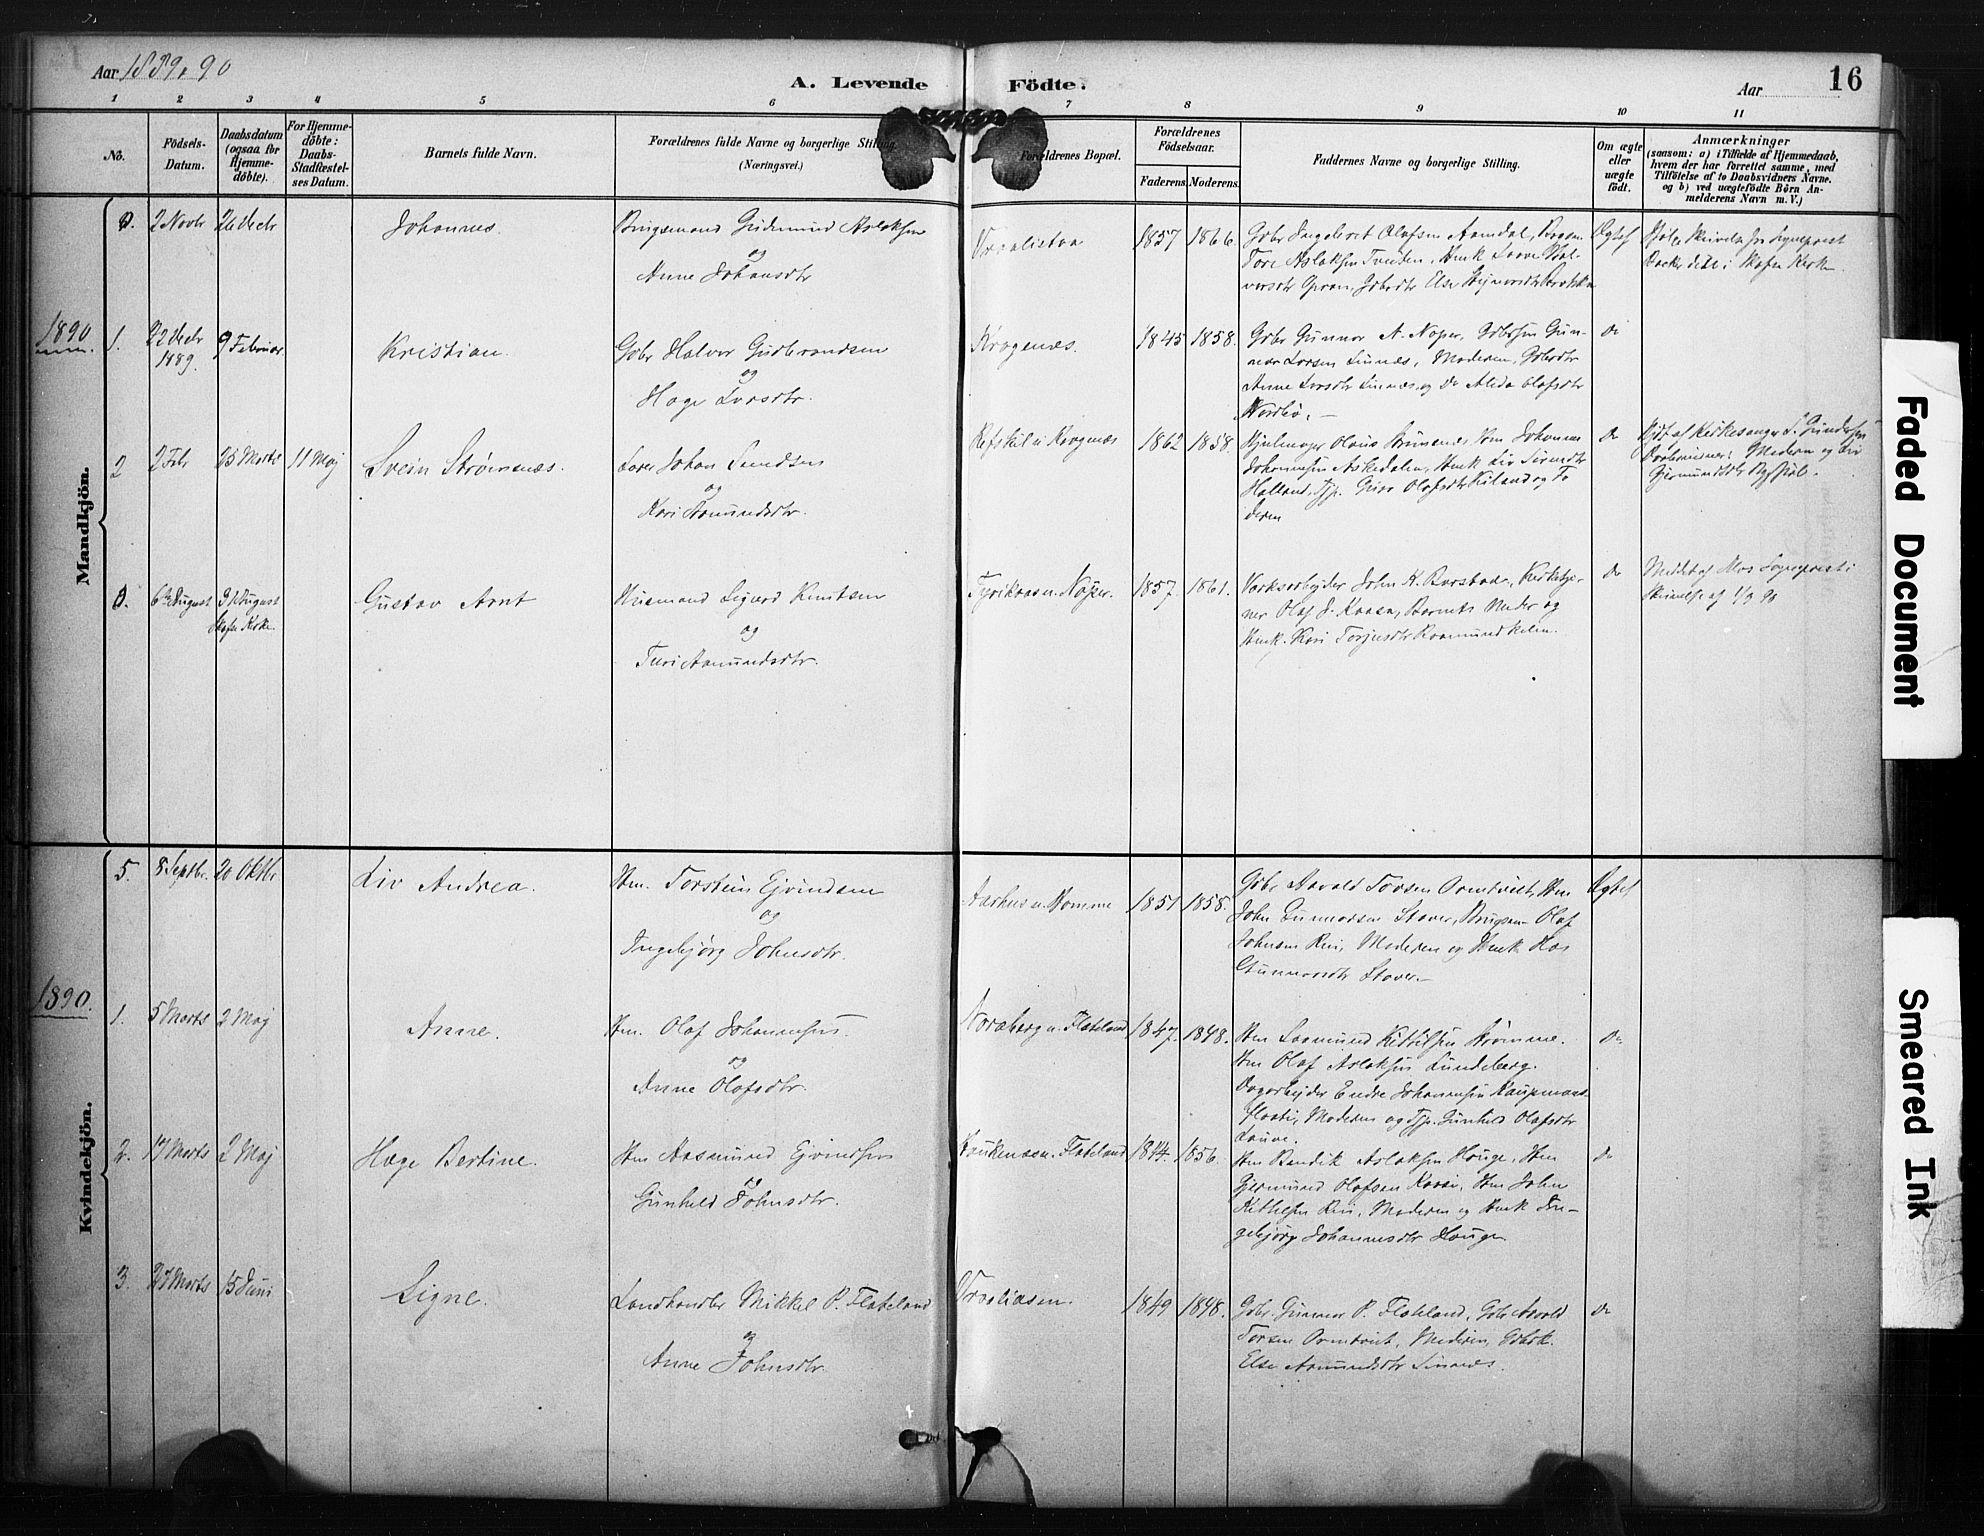 SAKO, Kviteseid kirkebøker, F/Fc/L0002: Ministerialbok nr. III 2, 1882-1908, s. 16